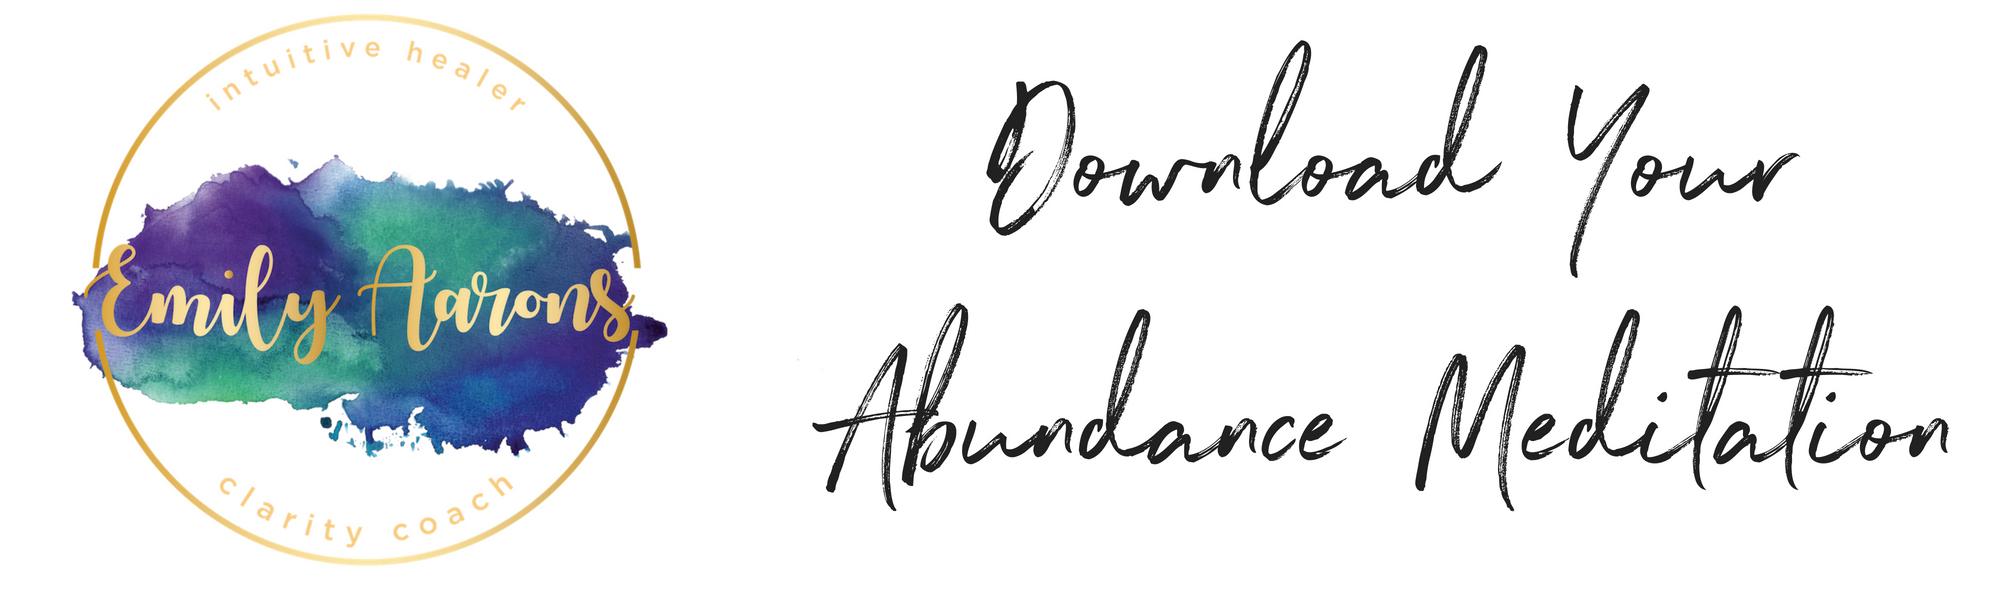 Download Your Abundance Meditation Below.jpg